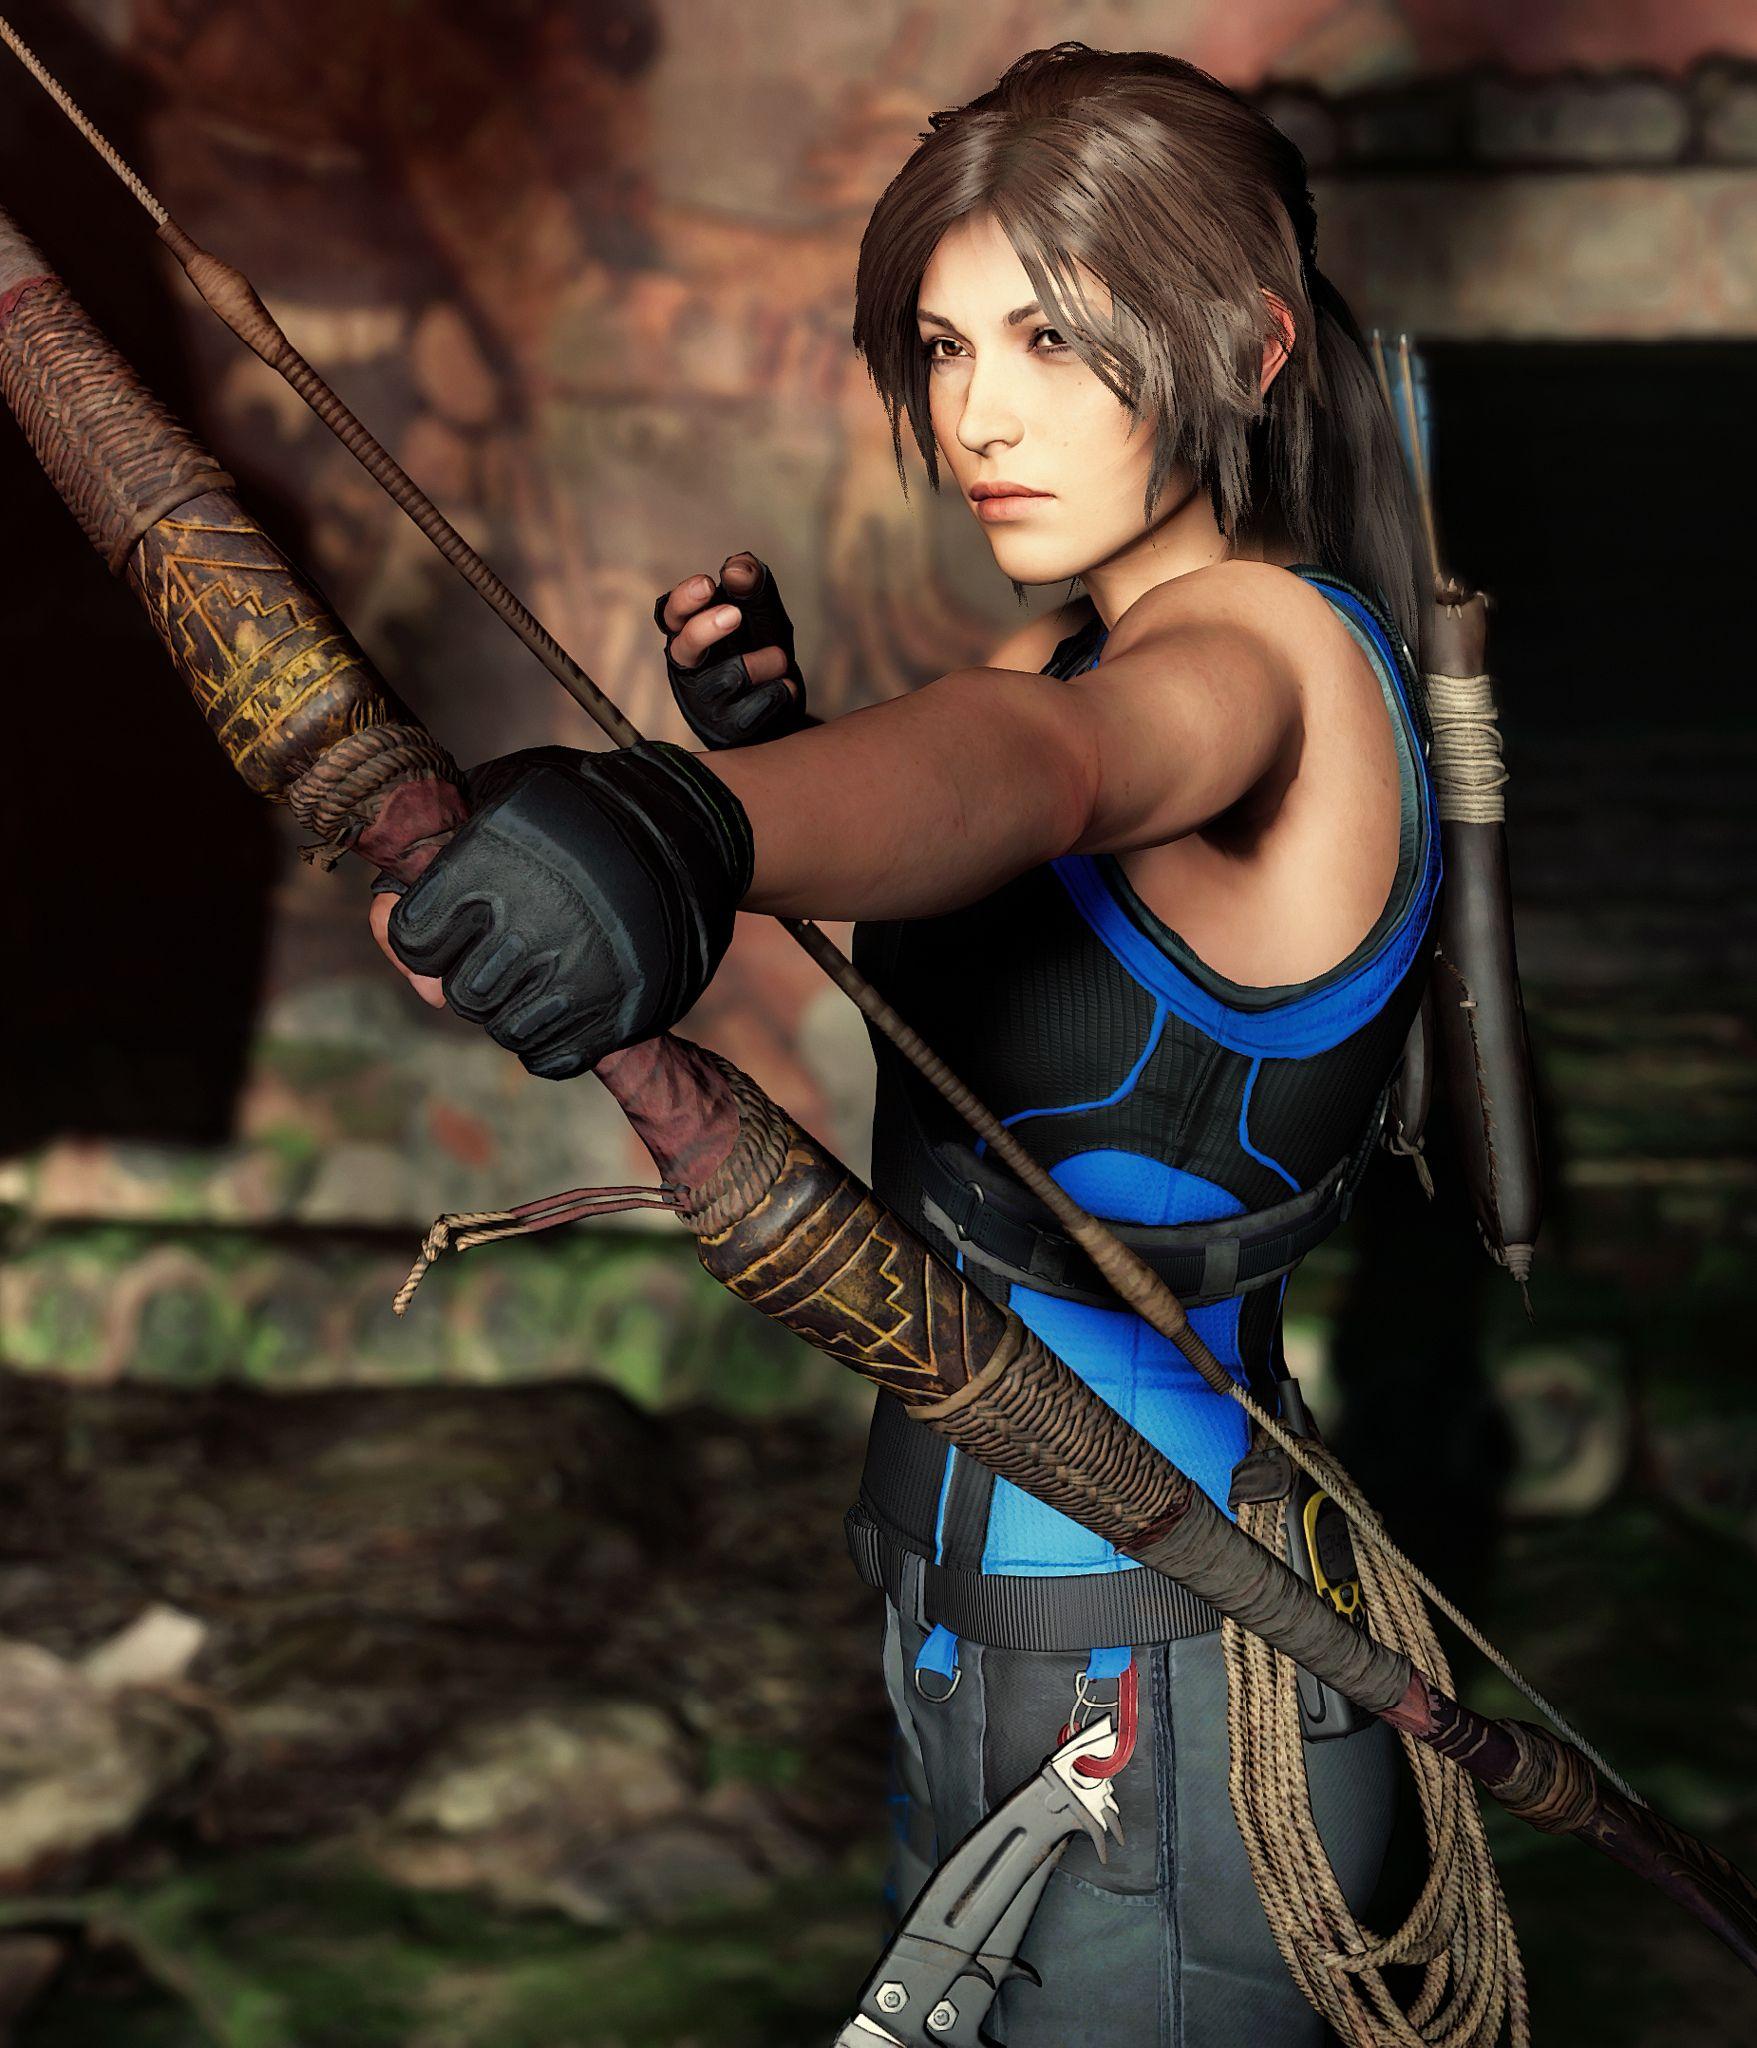 Shadow Of The Tomb Raider Tomb Raider Tomb Raider Lara Croft Tomb Raider Wallpaper Shadow of tomb raider video game